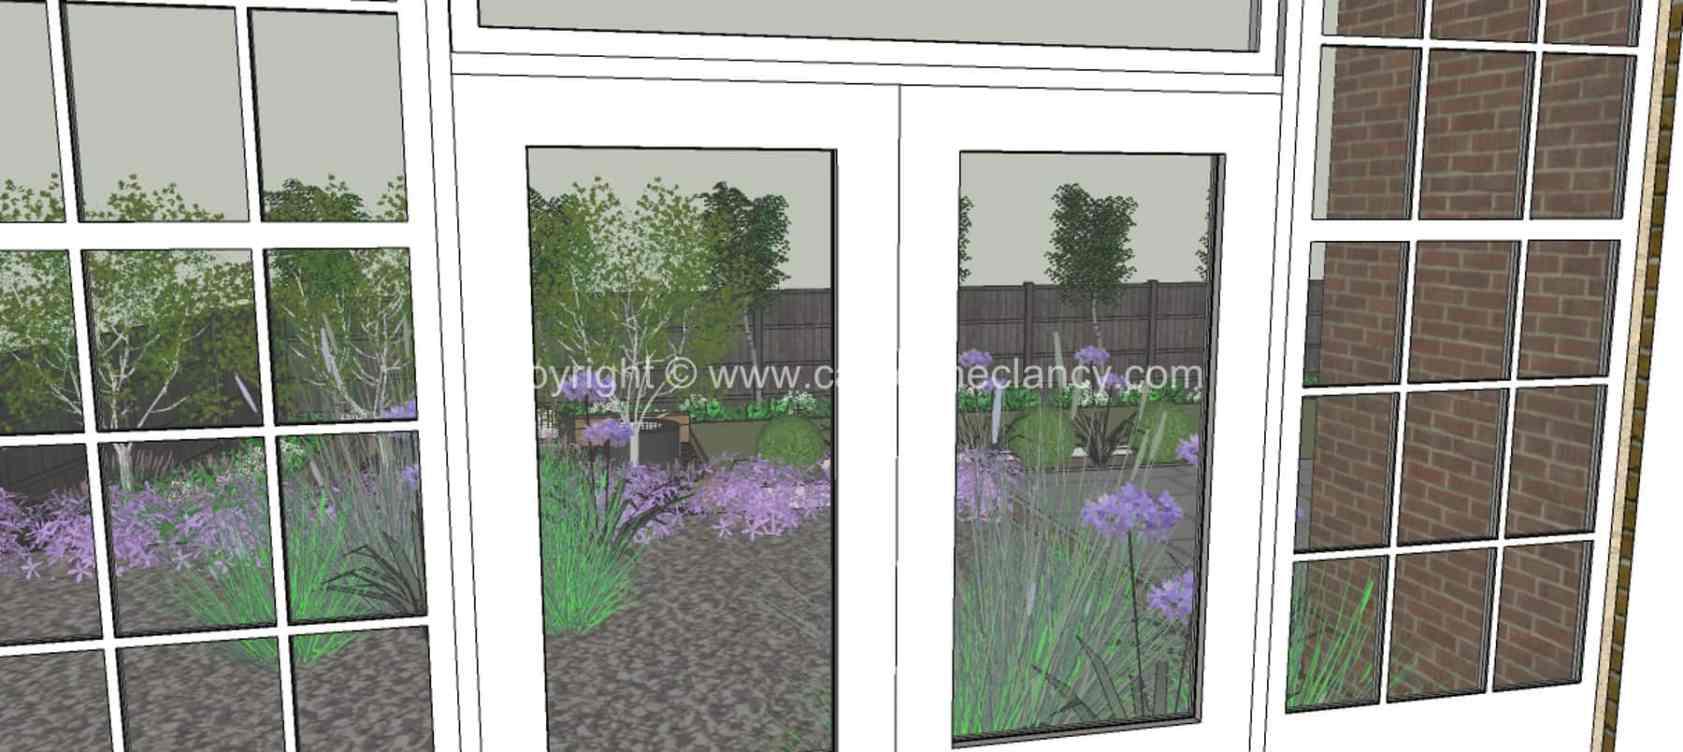 hendon-grand-design-garden-7